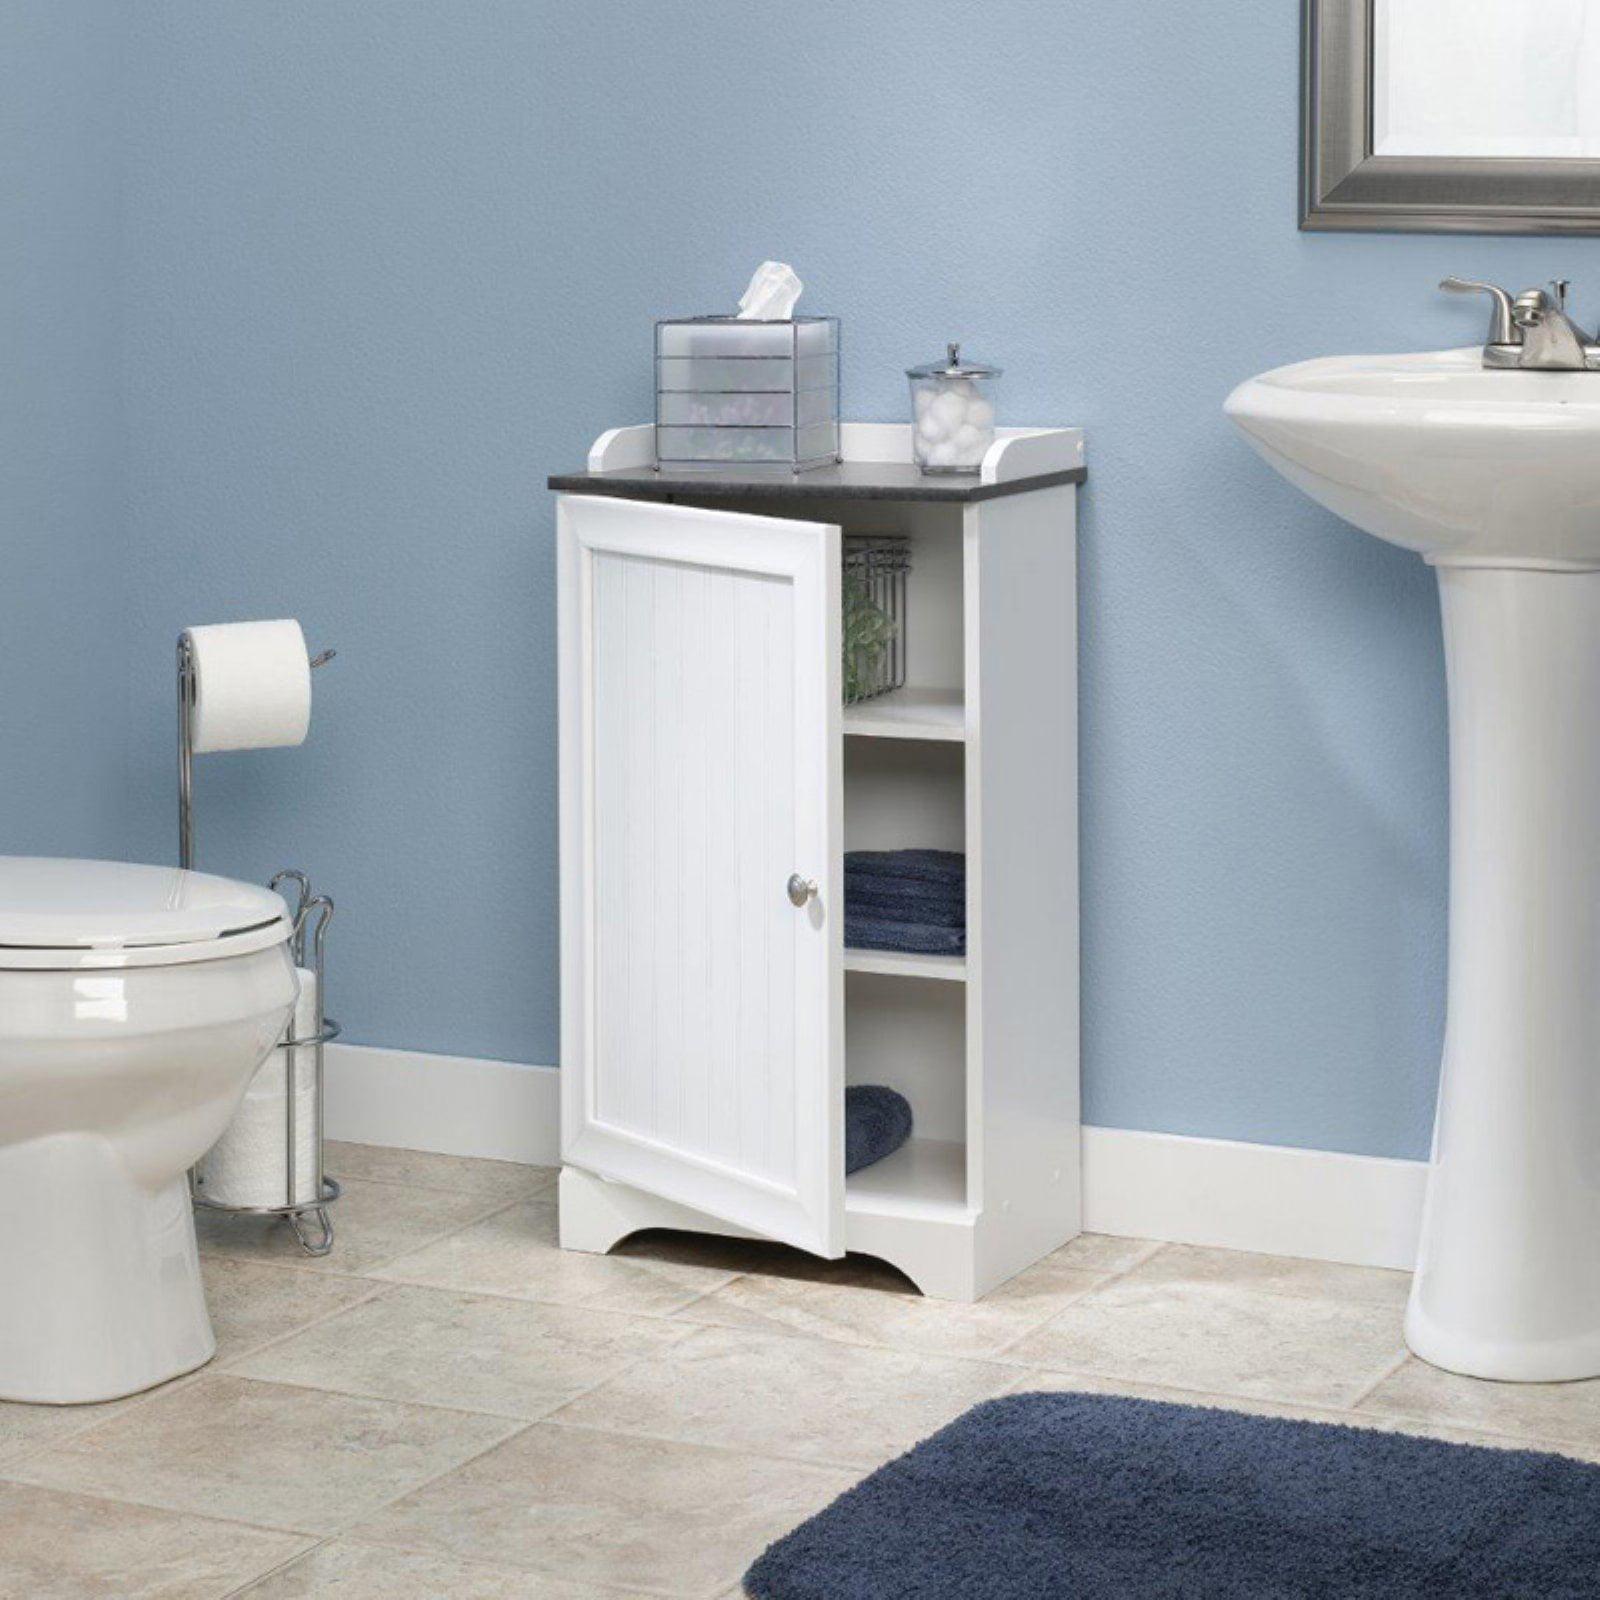 Sauder Caraway Floor Cabinet, Soft White Finish